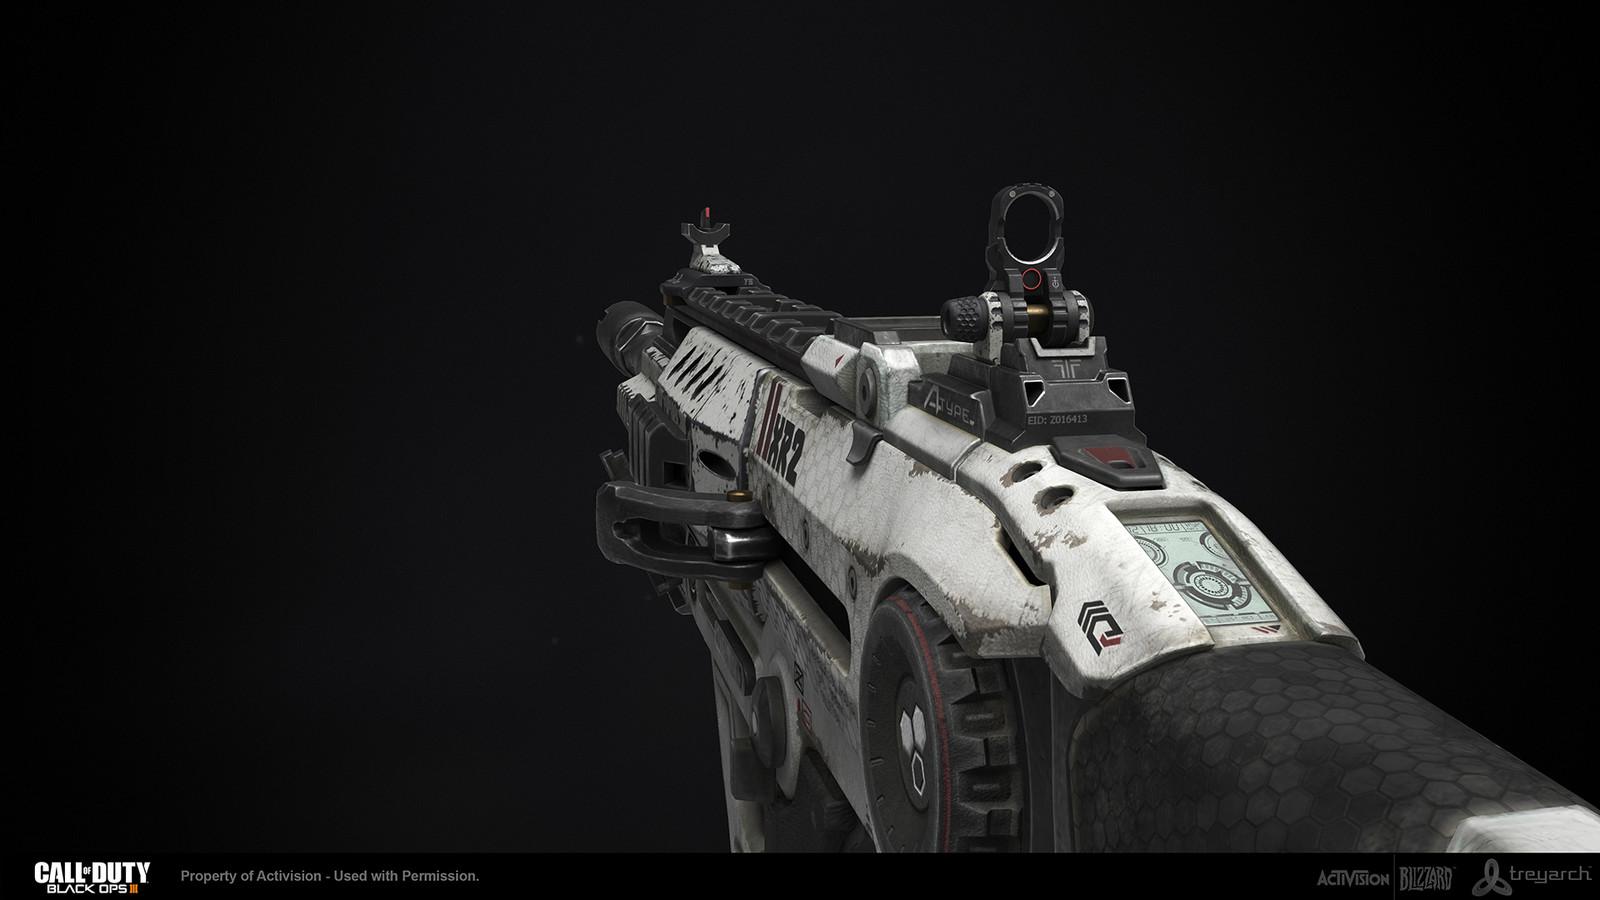 ArtStation - Call of Duty: Black Ops 3 - XR2 AR, Caleb Turner